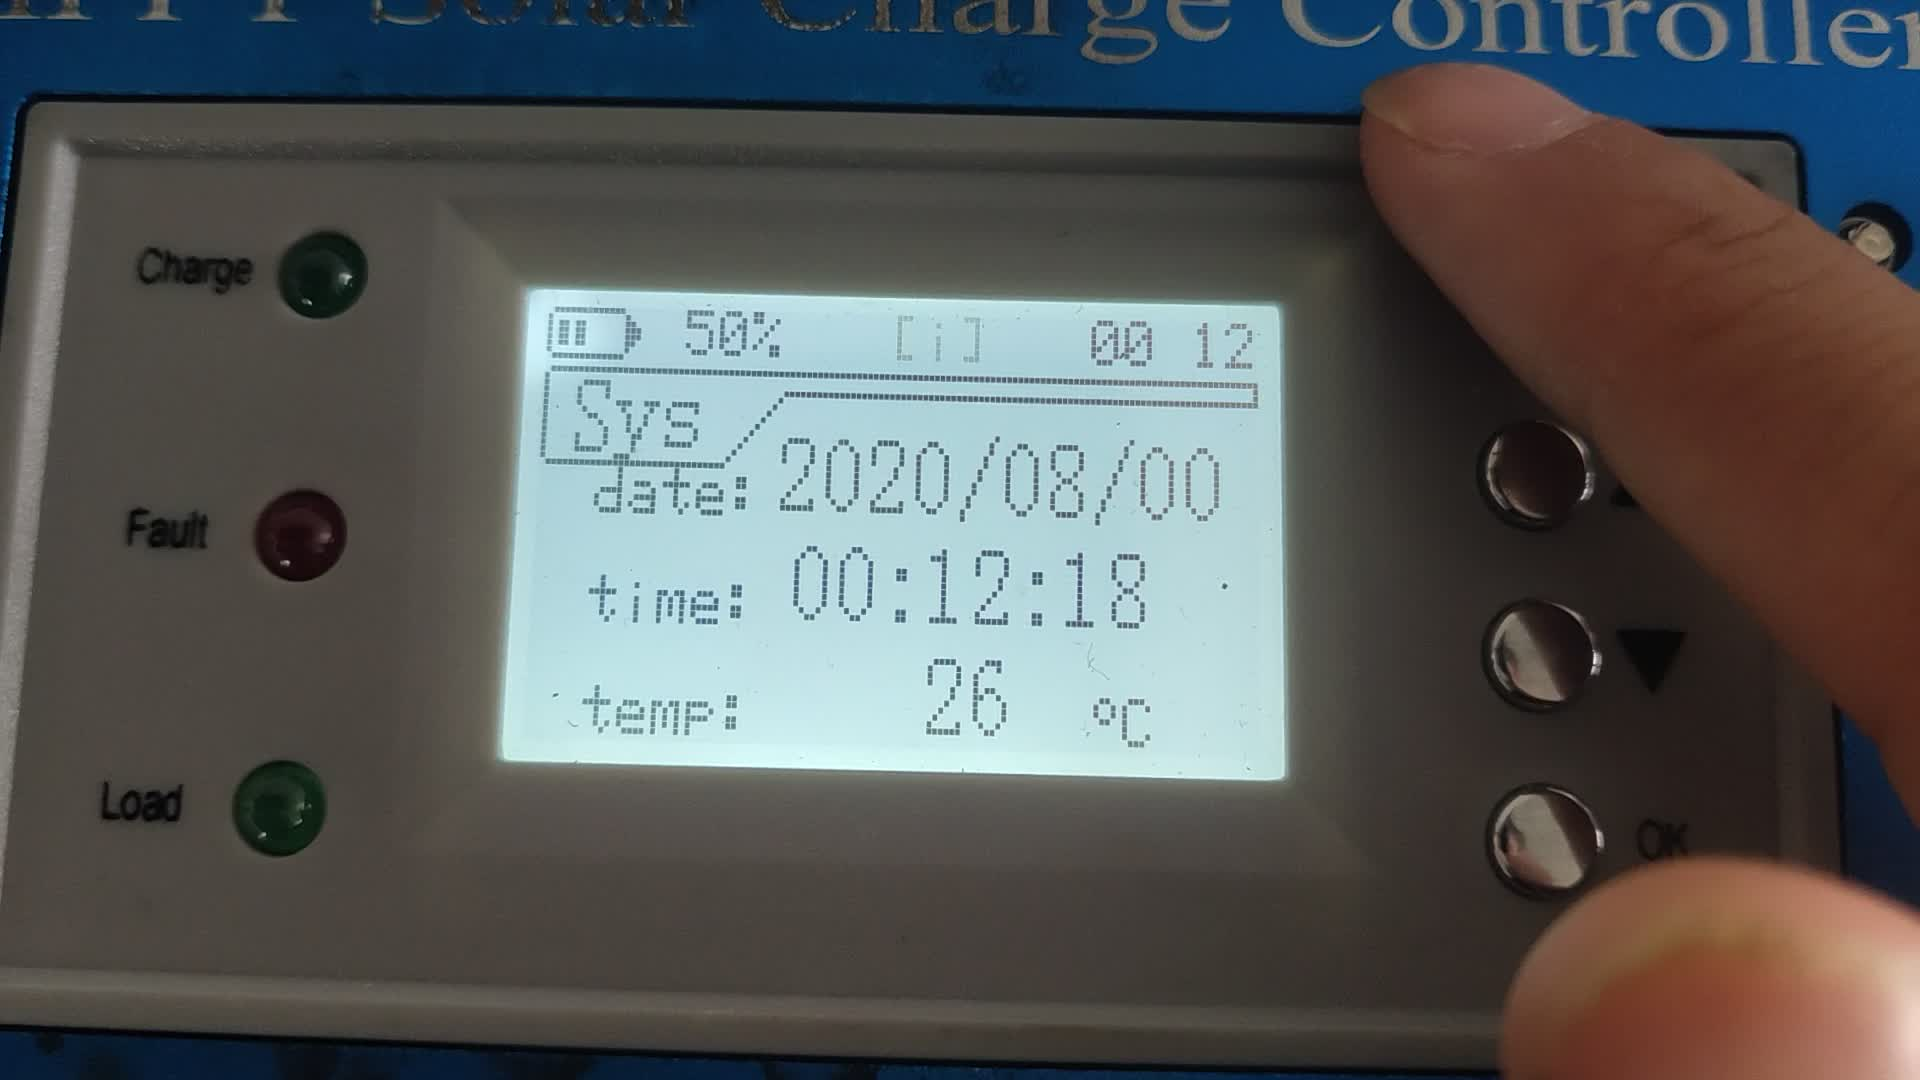 Gaoneng Solar hybrid 12v 24V 60A mppt คอนโทรลเลอร์ชาร์จพลังงานแสงอาทิตย์